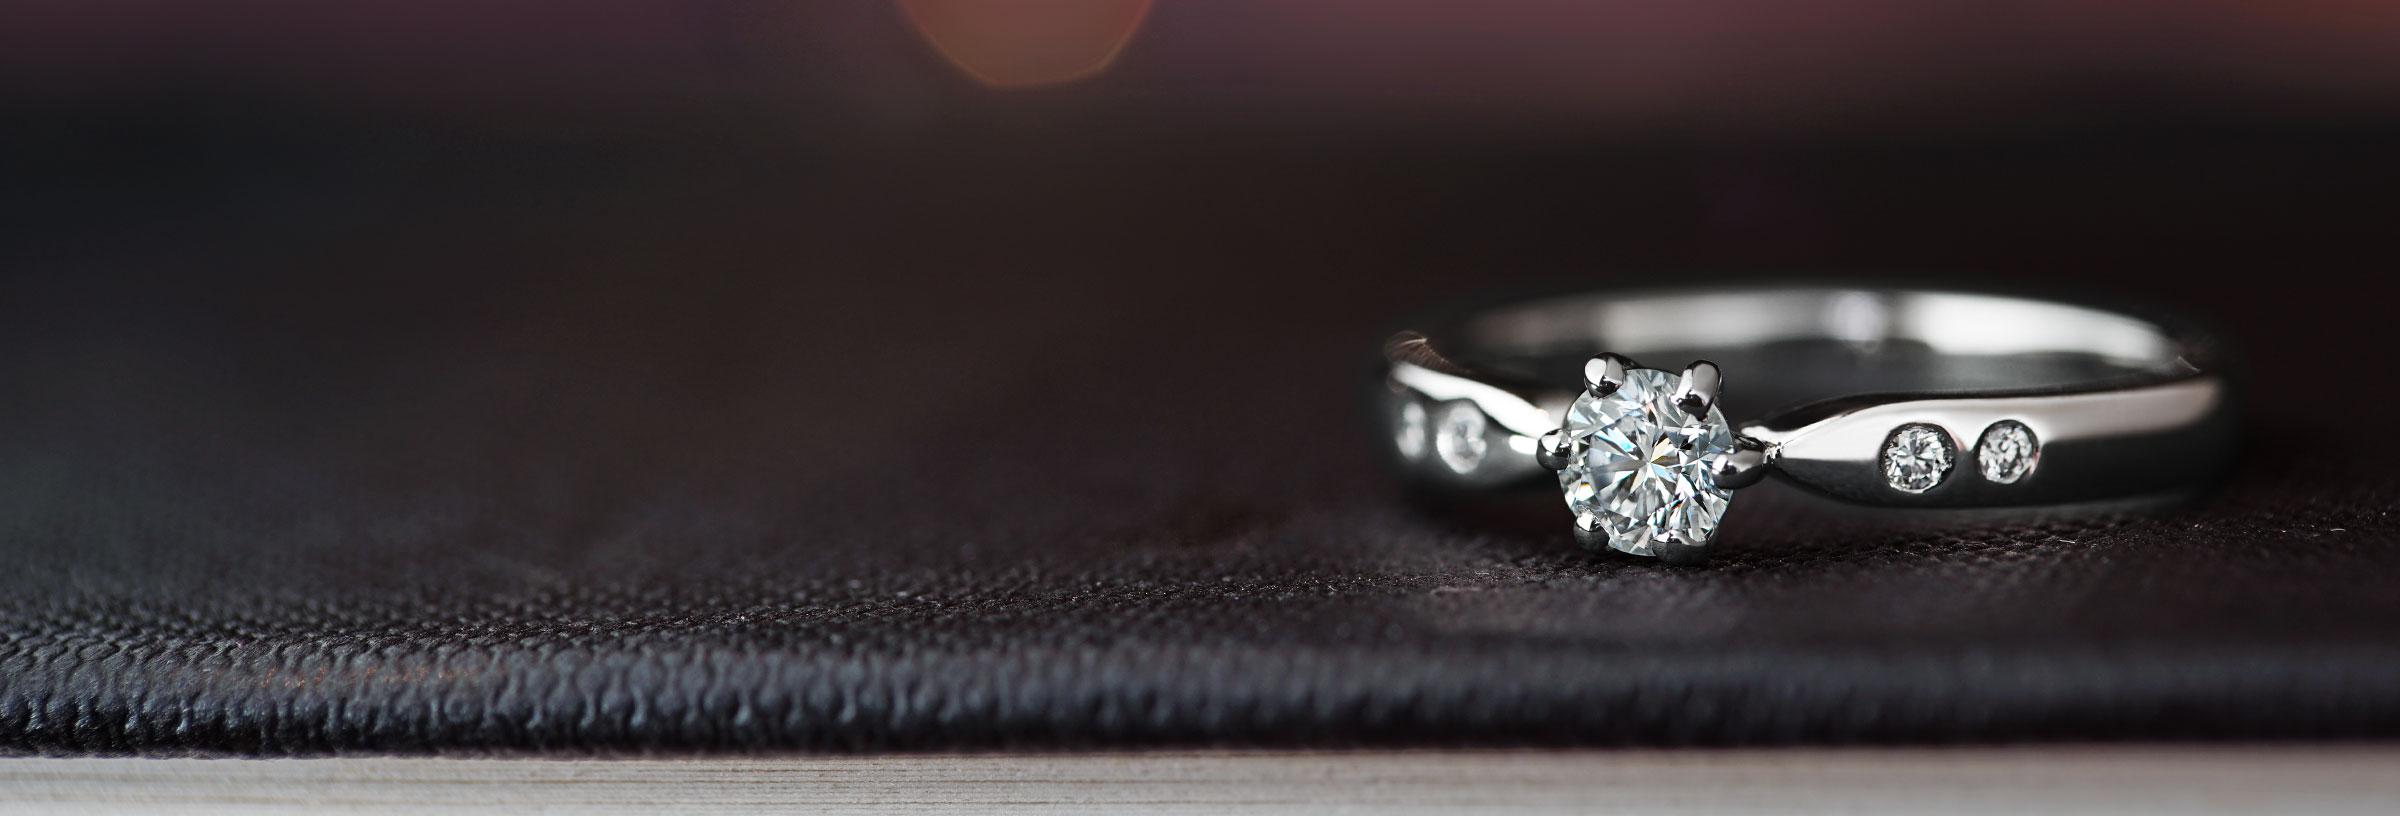 Delicate 0.31ct diamond engagement ring